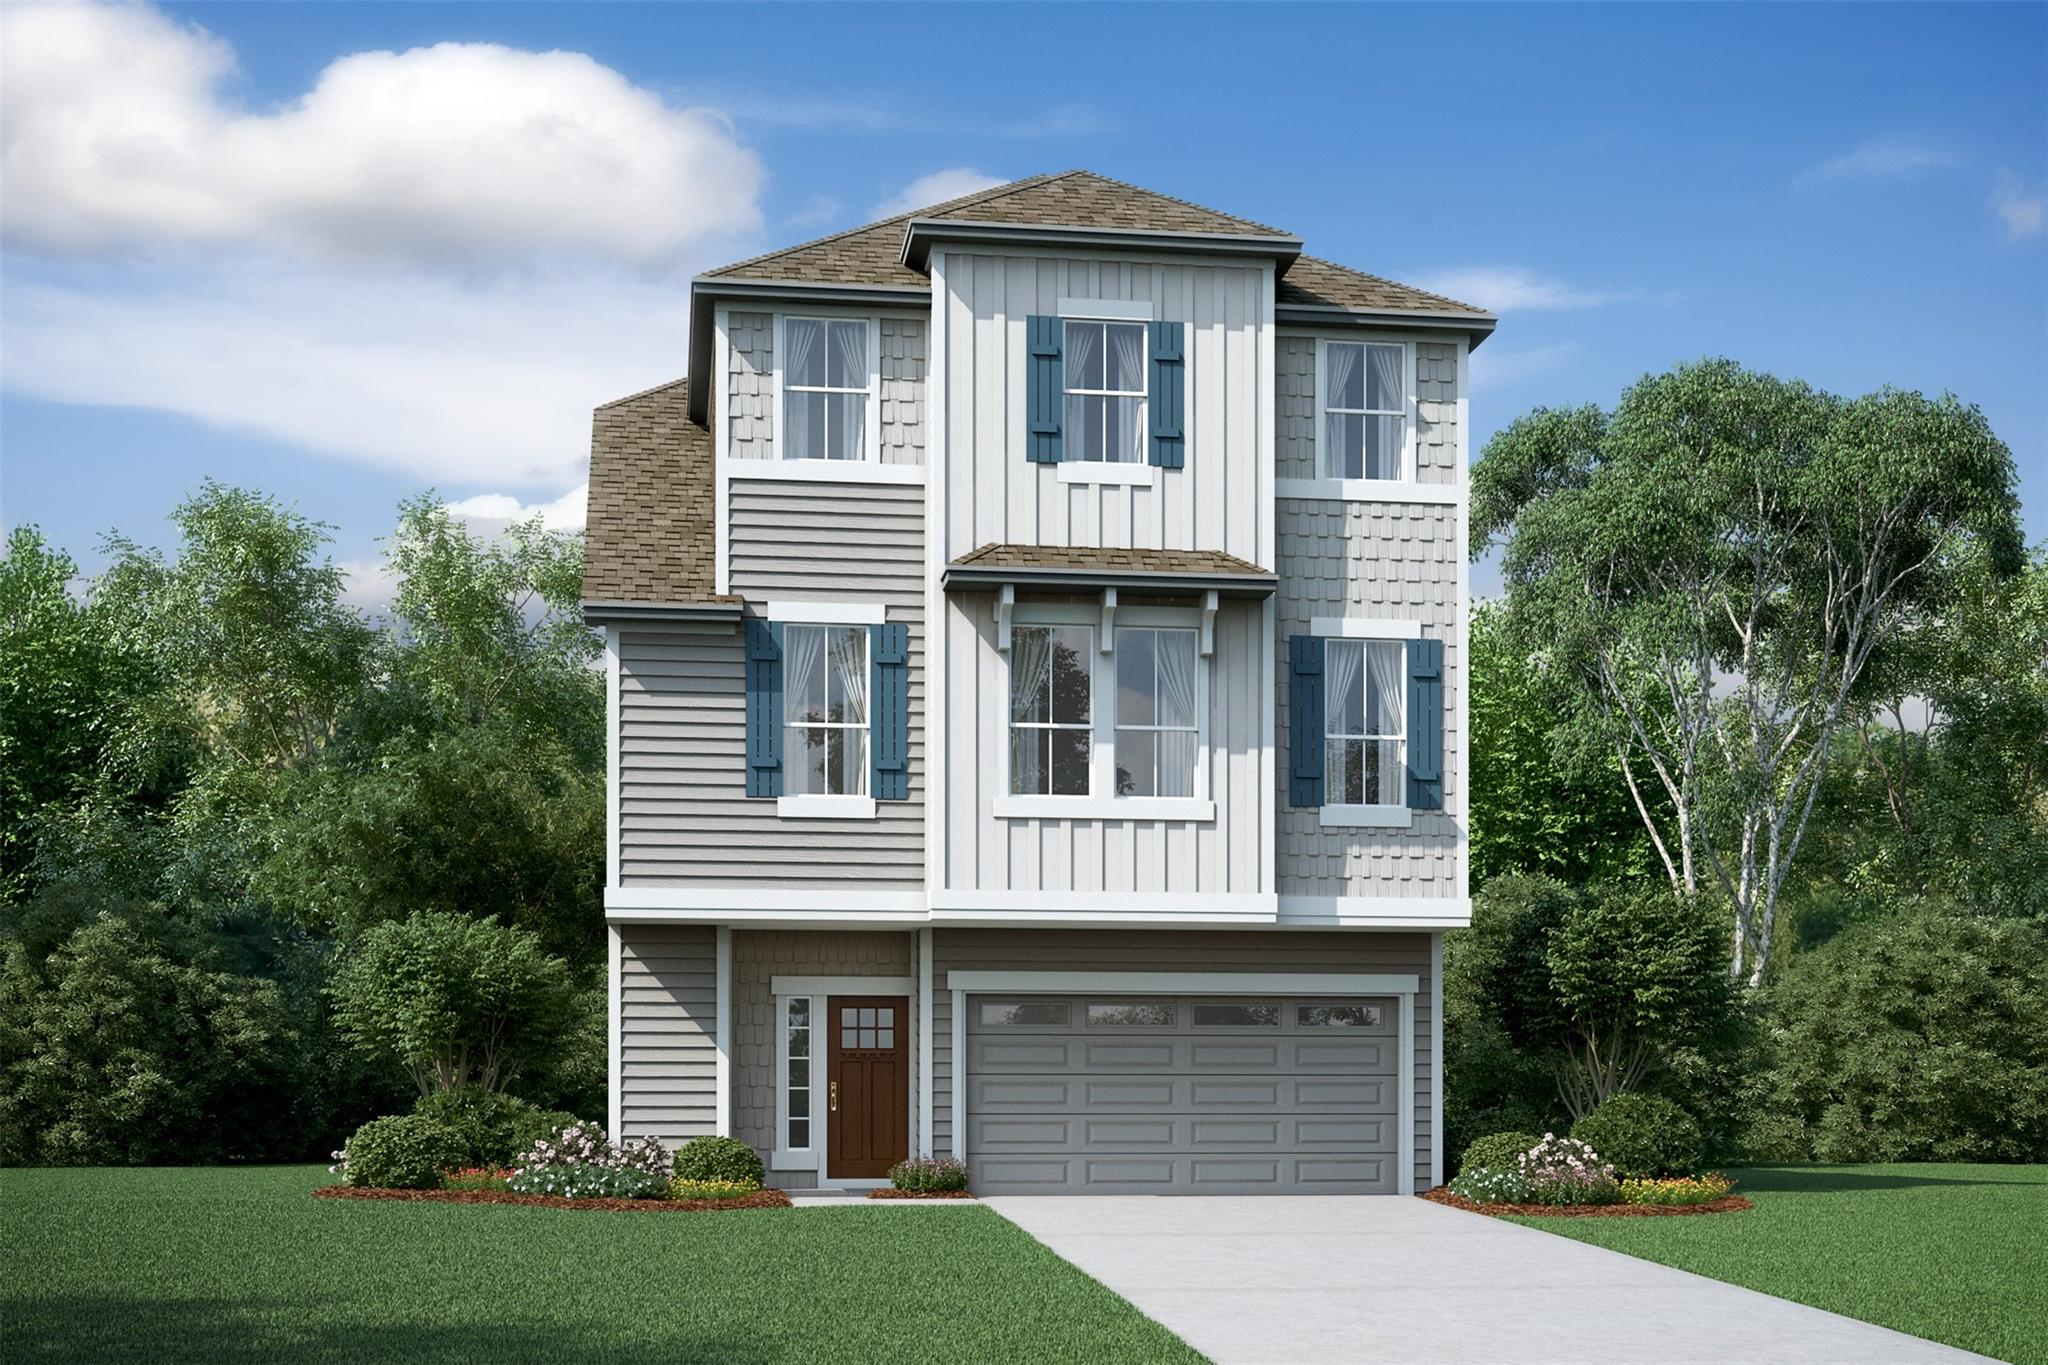 12007 Ridgewood Hill Drive Property Photo - Houston, TX real estate listing